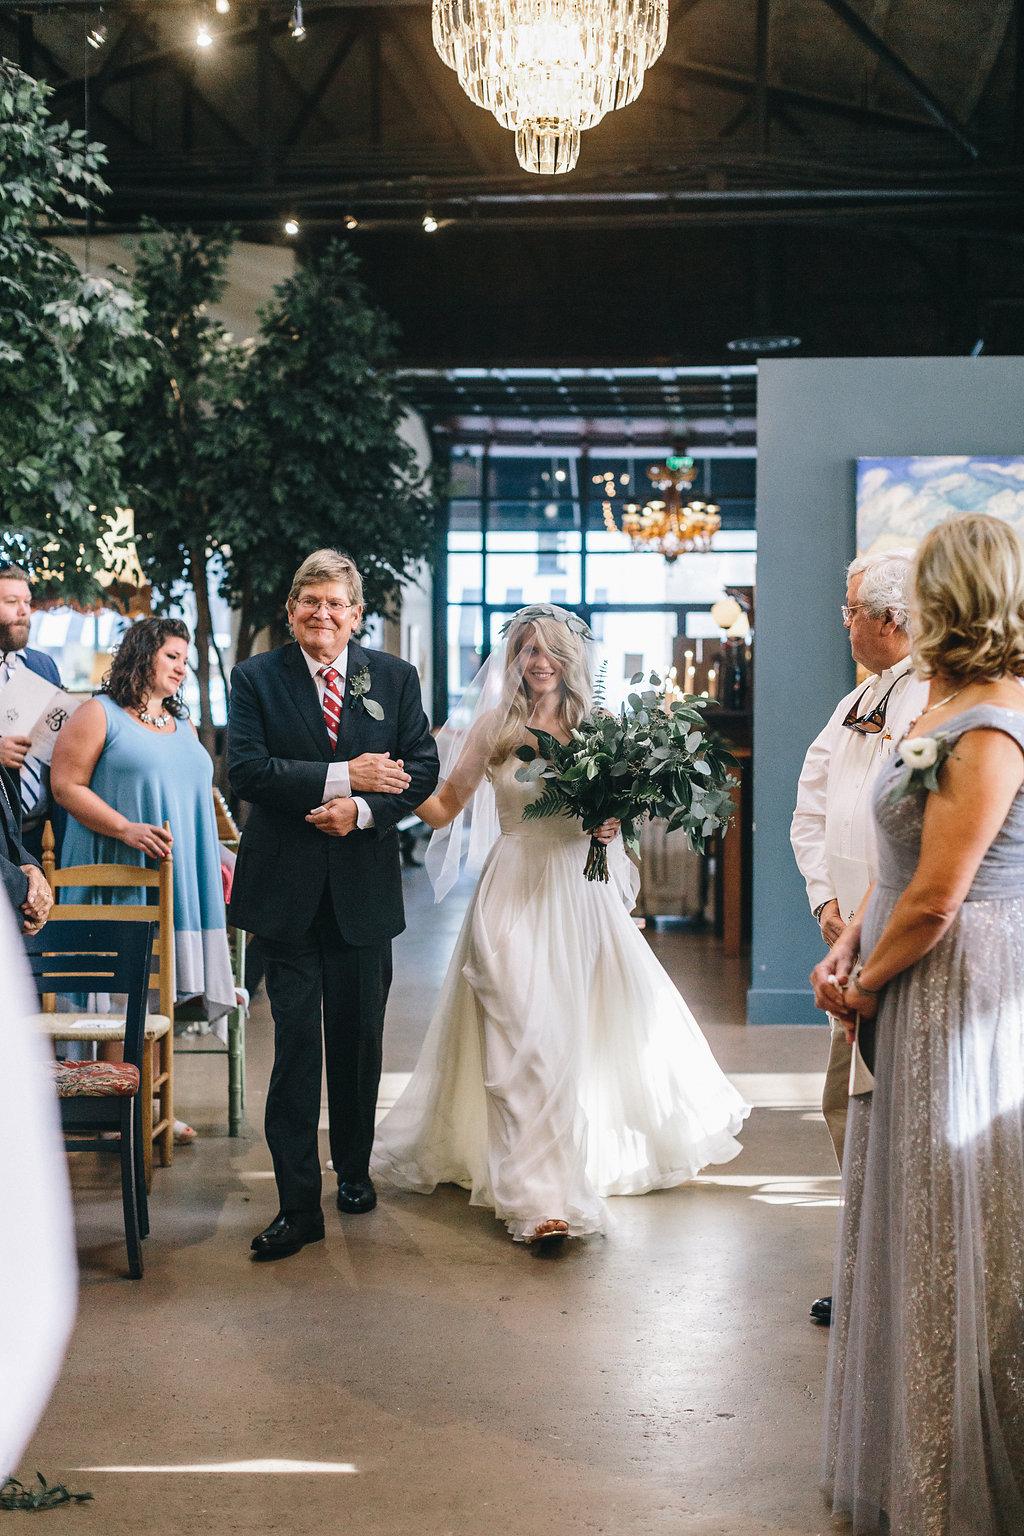 shannon-britt-mackensey-alexander-photography-green-wedding-shoes-ivory-and-beau-bridal-boutique-savannah-wedding-planner-savannah-bridal-boutique-savannah-wedding-dresses-savannah-florist-summer-solstice-wedding-boho-soho-south-cafe-wedding-50.jpg